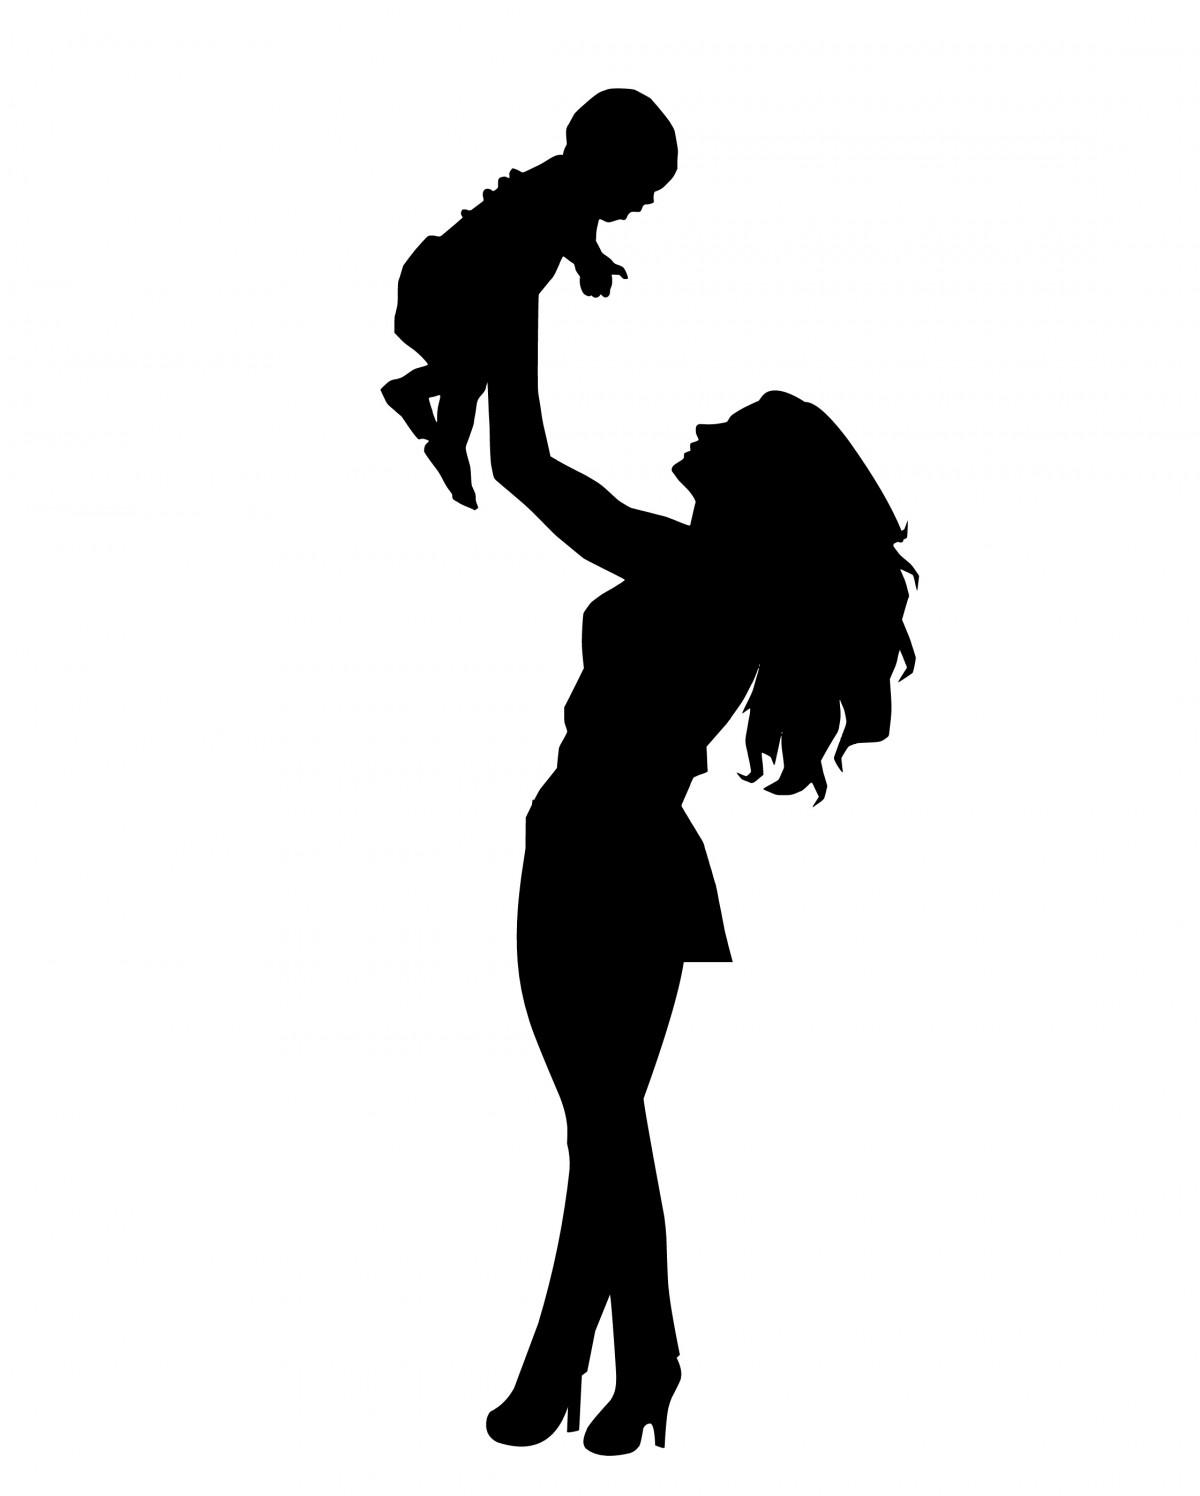 картинка силуэт матери задача